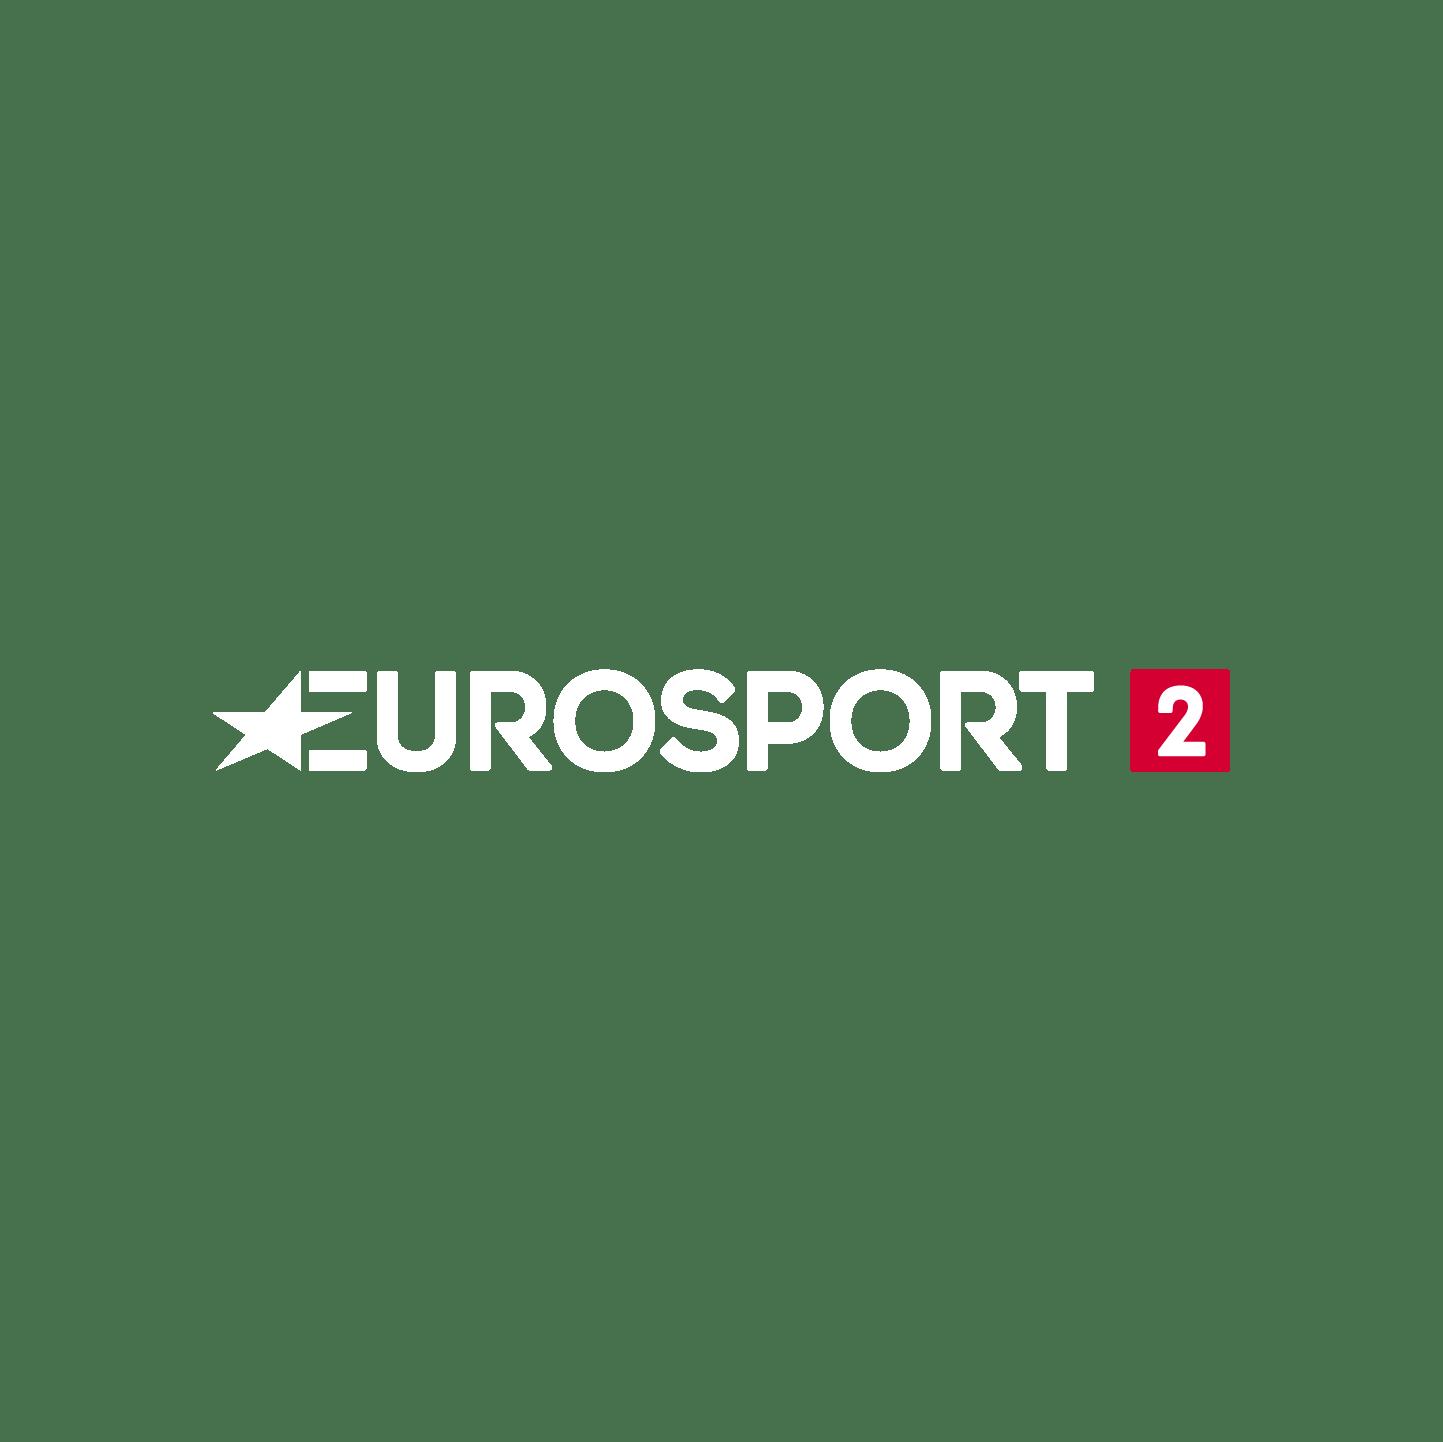 Logo Eurosport 2